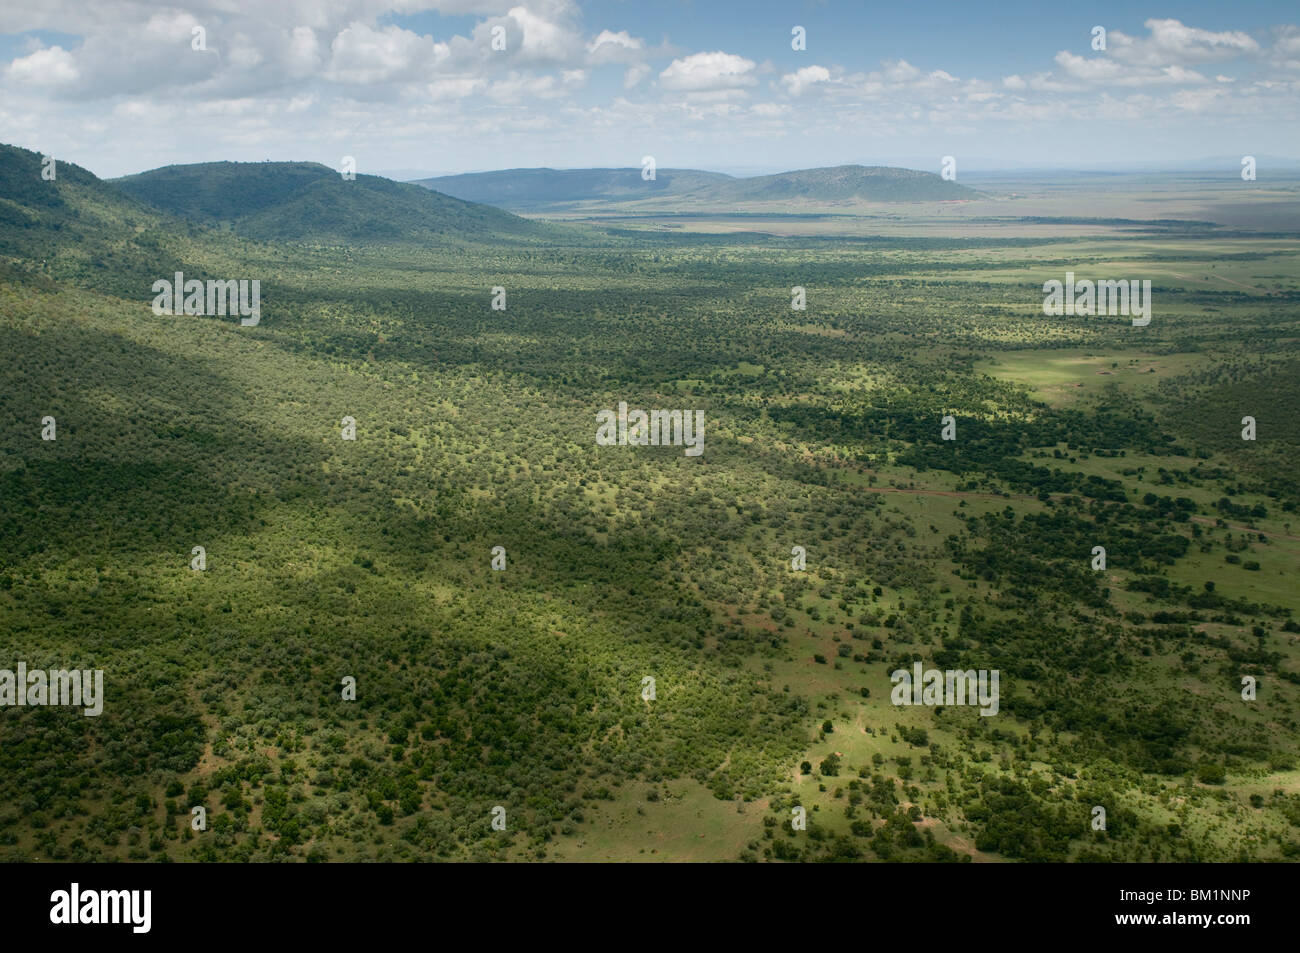 Reserva Nacional de Masai Mara, Kenia, África oriental, África Imagen De Stock